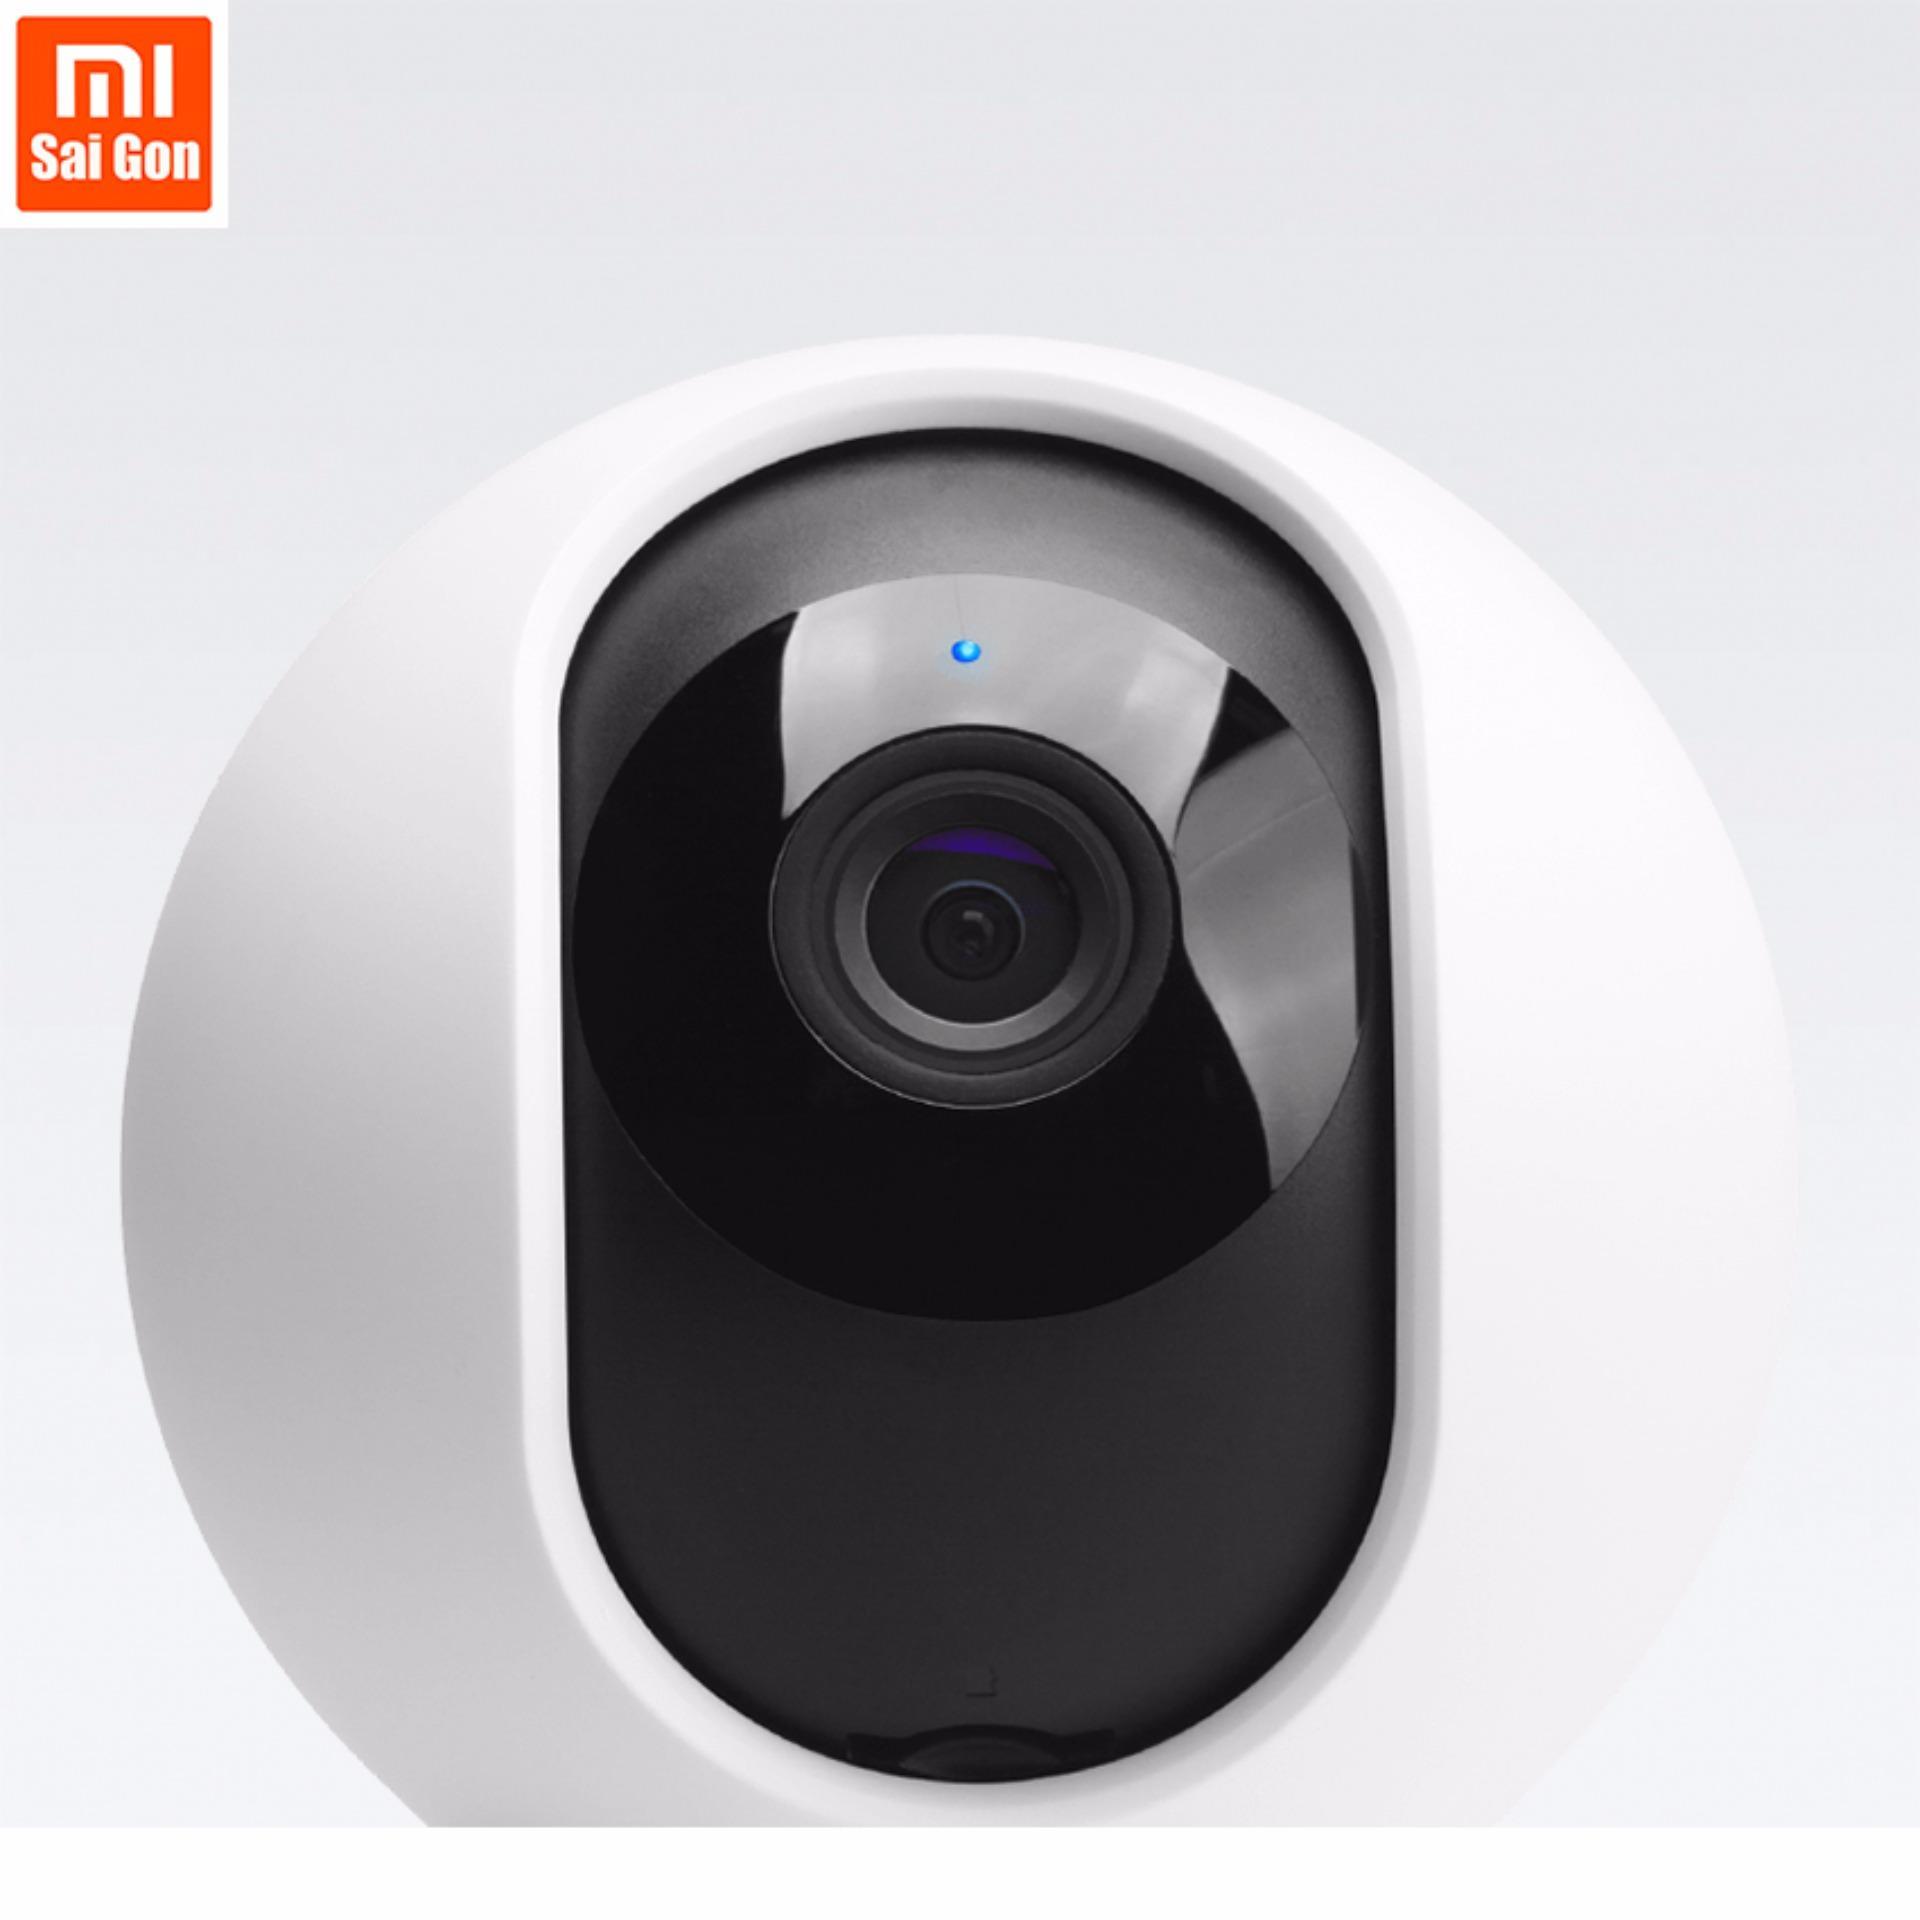 Camera Ip Mijia Xiaomi Xoay 360 Độ 720P Hồng Ngoại